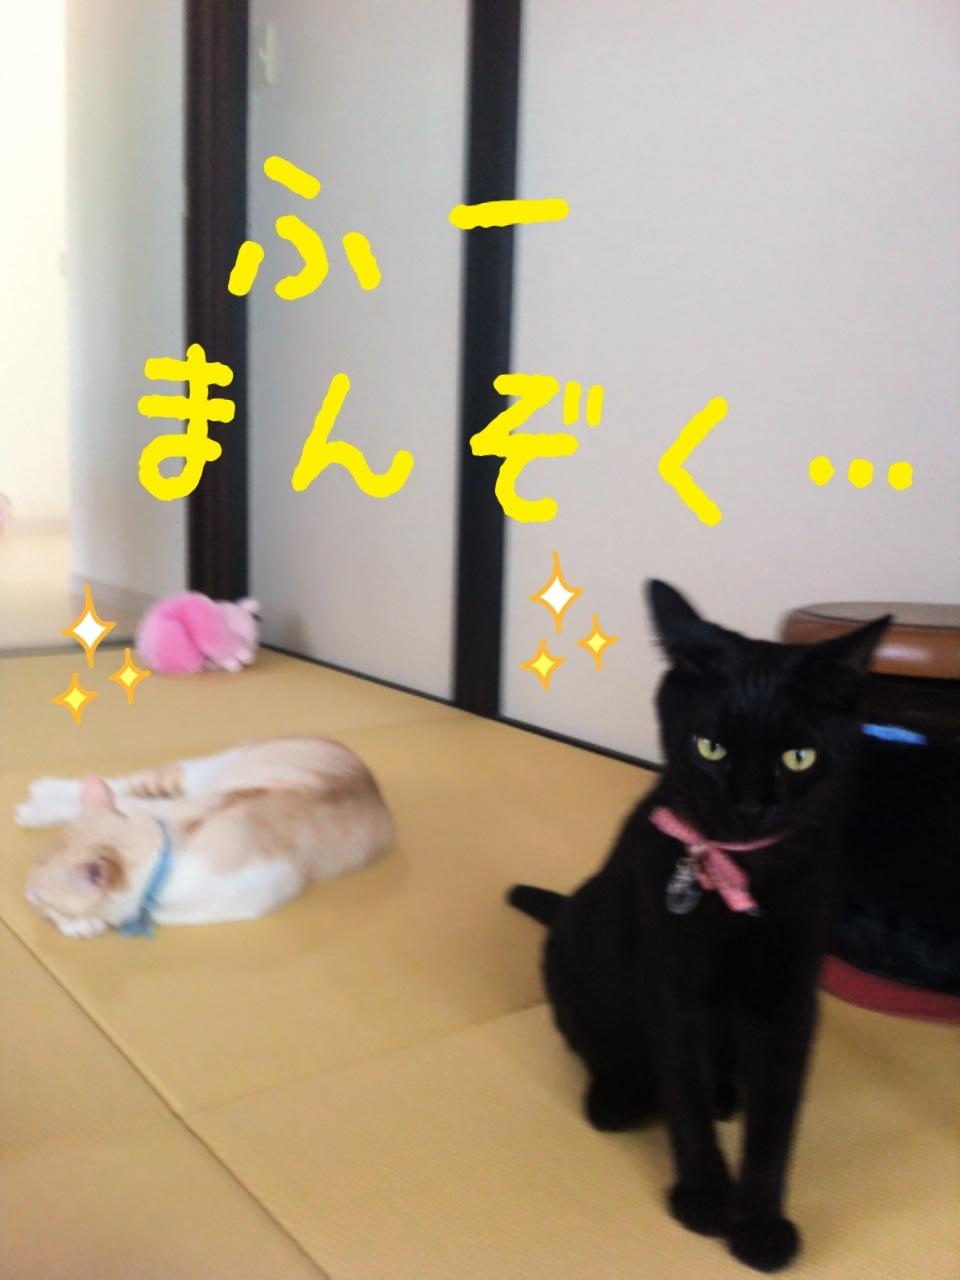 image_20130708200719.jpg